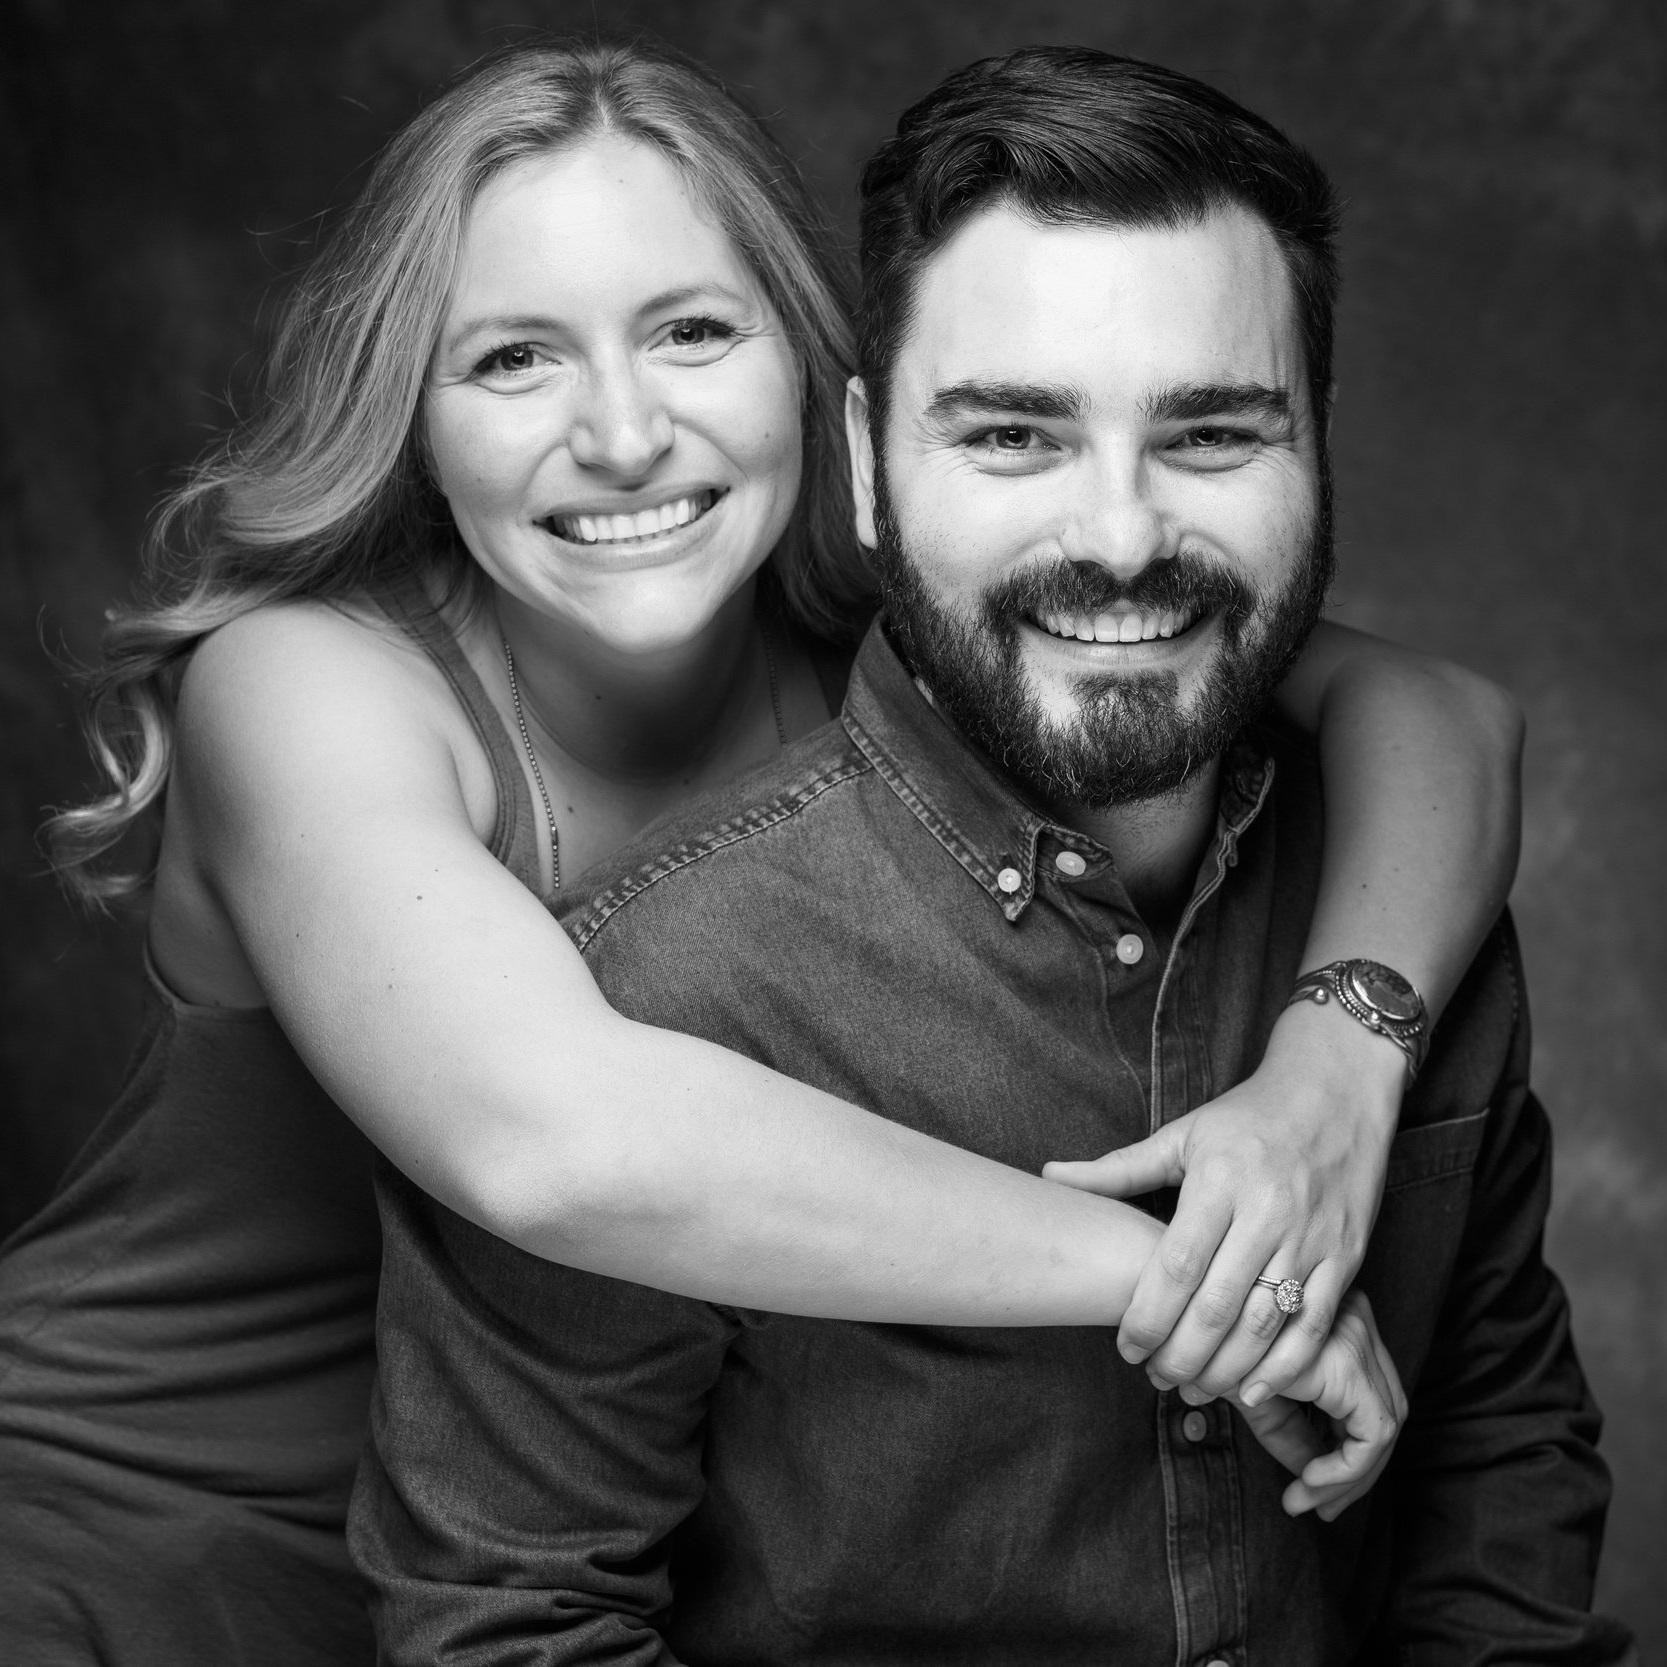 David & Amber Hays - Associate Pastor and Worship Leader